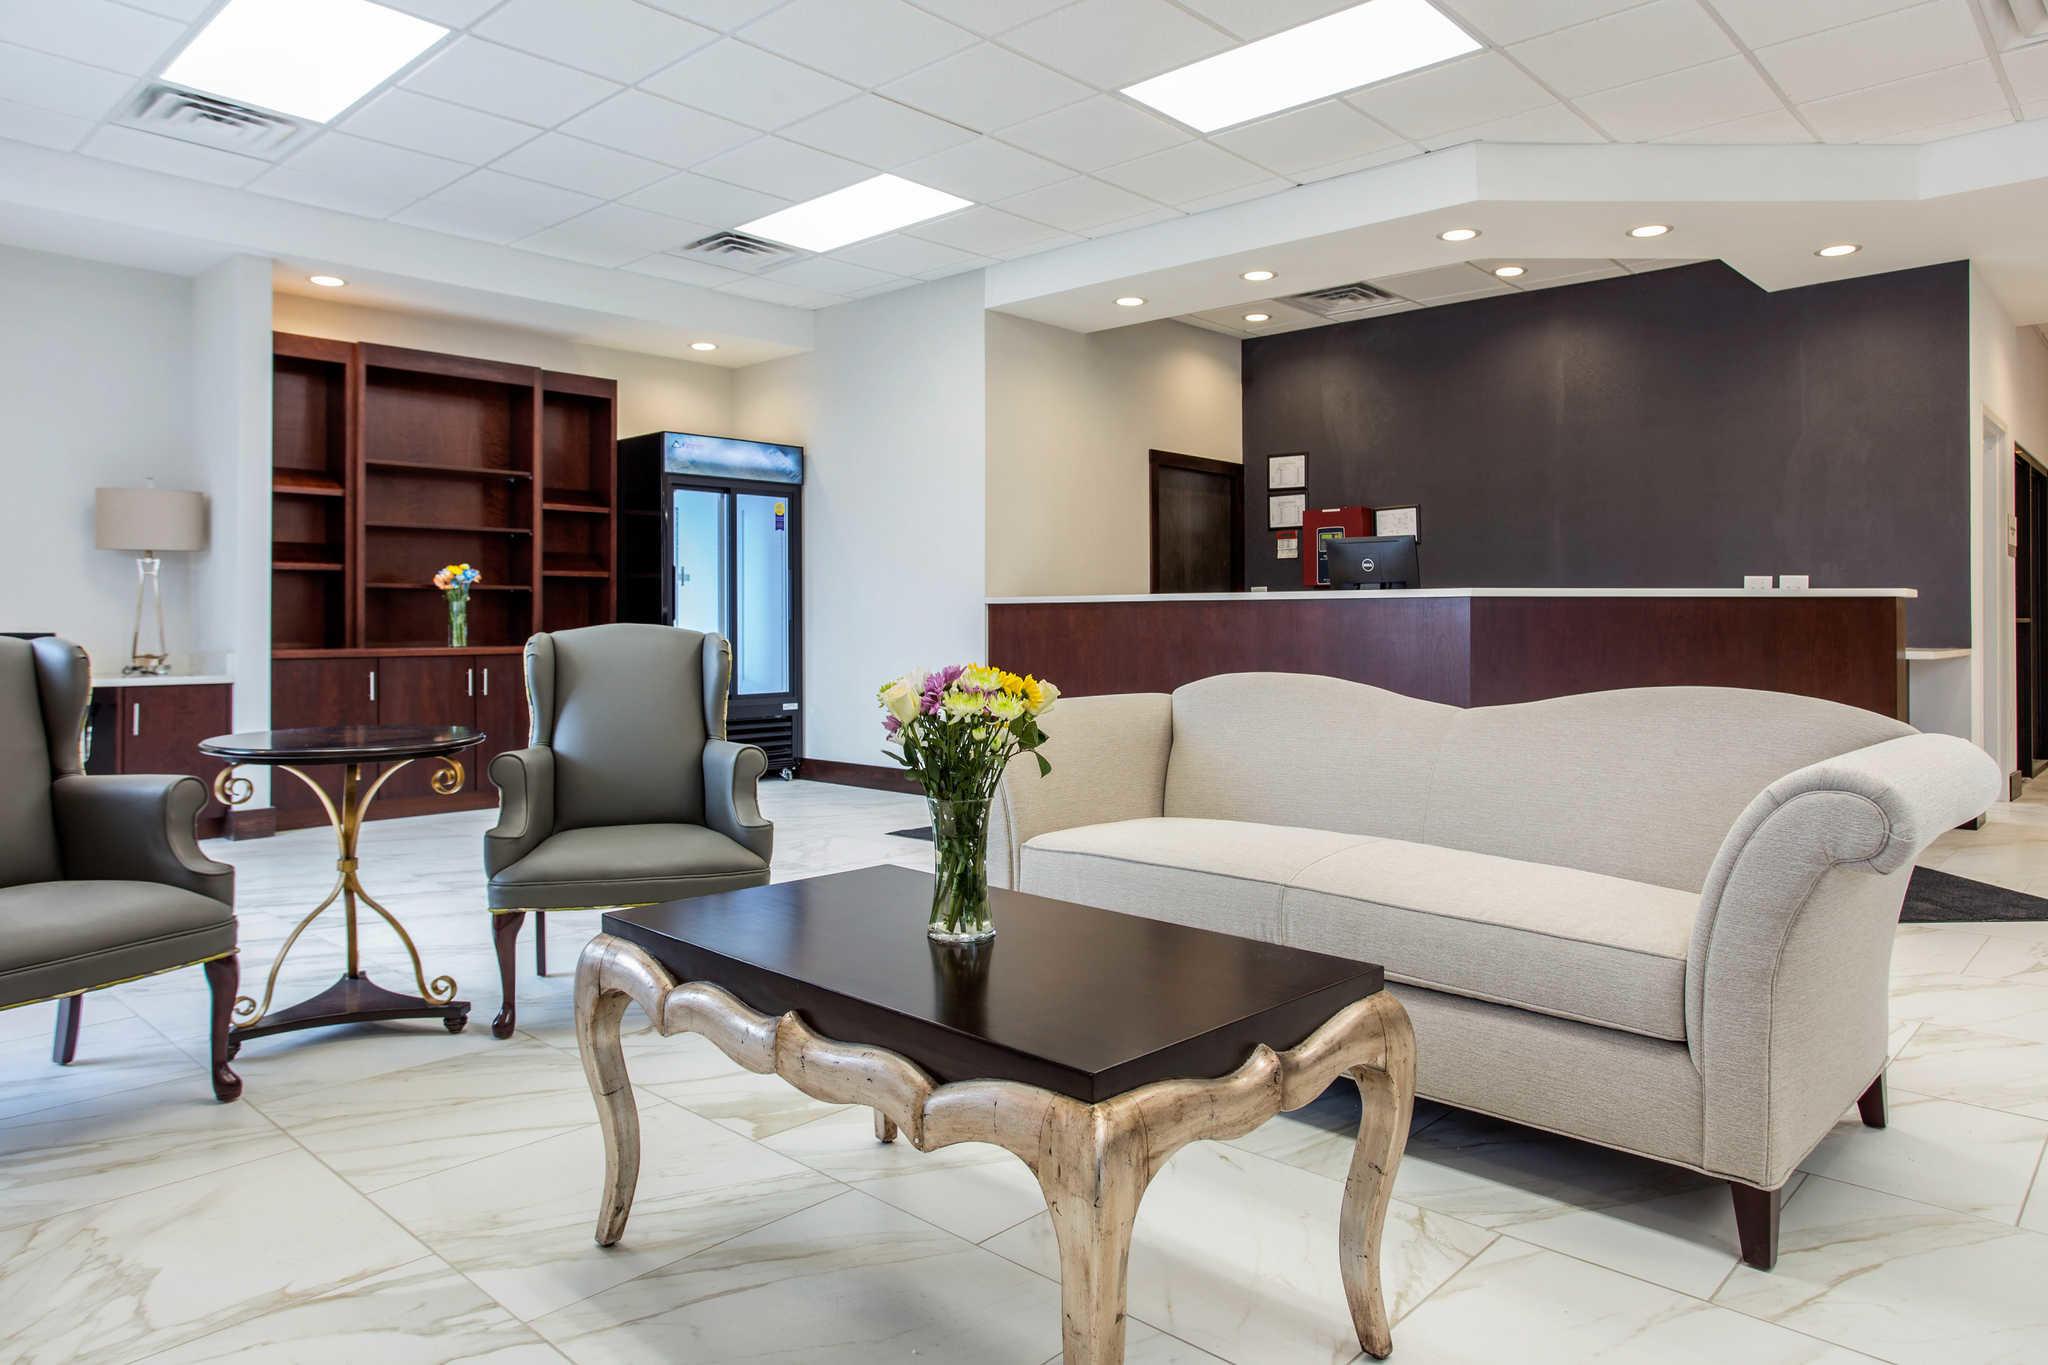 Clarion Inn & Suites image 4